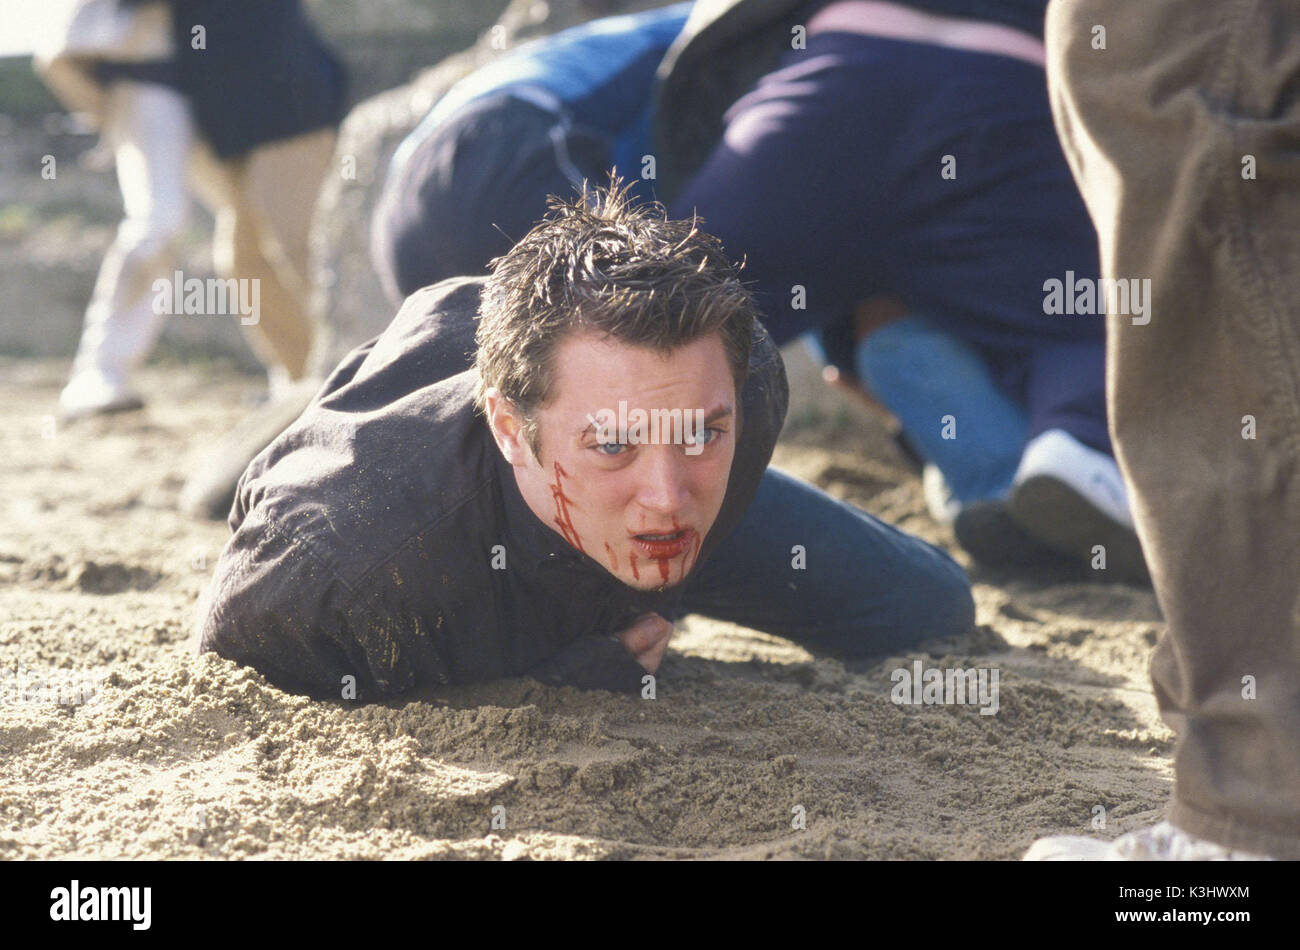 GREEN STREET ictured: Matt Buckner falls during a fight. HOOLIGANS aka GREEN STREET ELIJAH WOOD     Date: 2005 - Stock Image